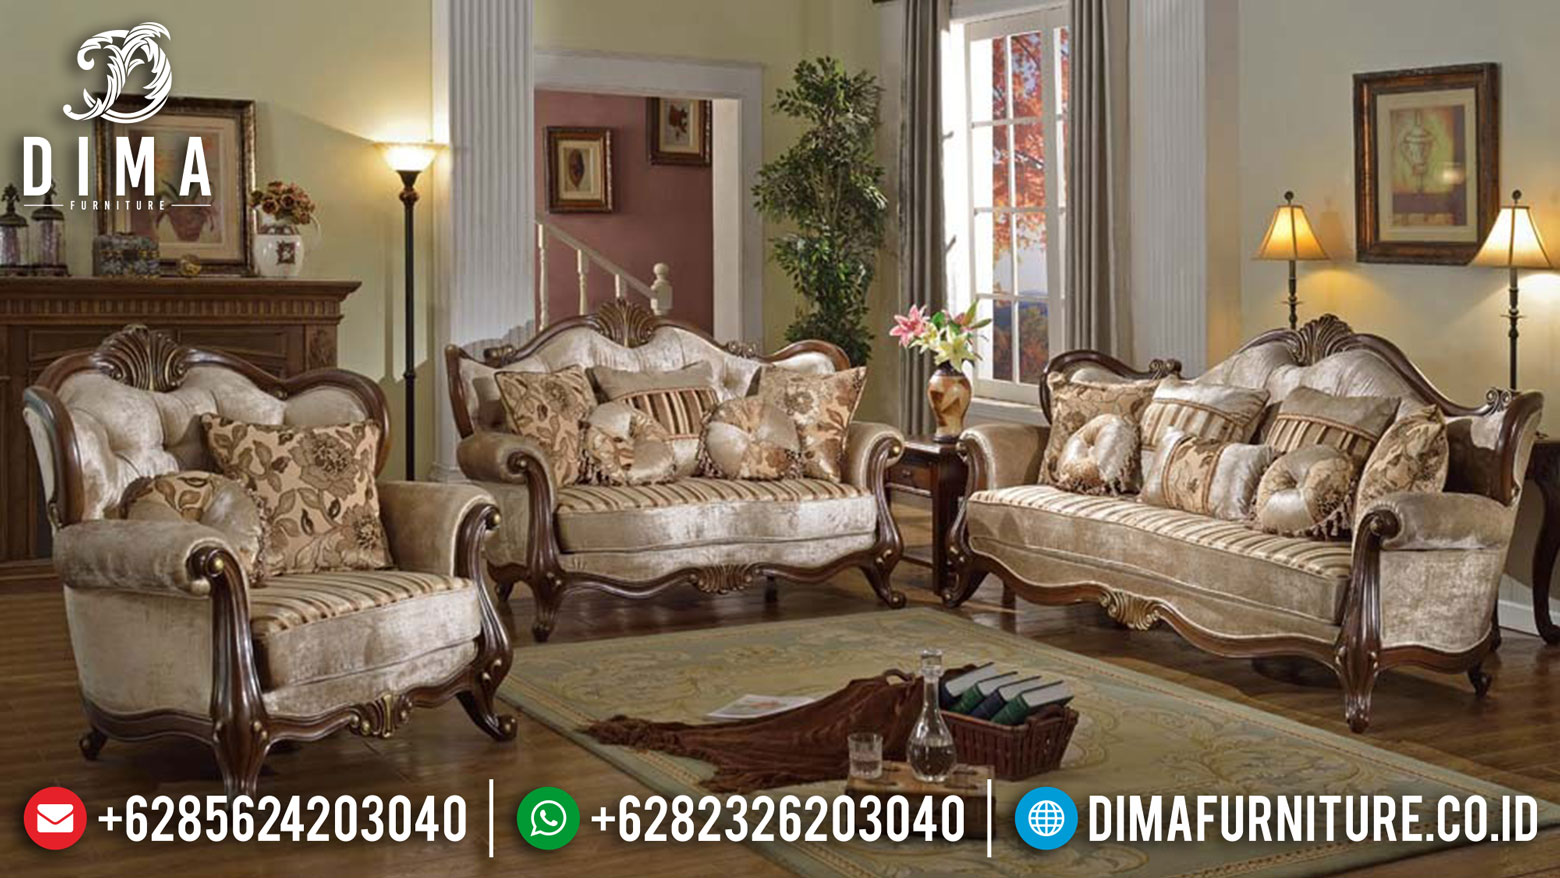 Sofa Ruang Tamu Mewah Terbaru Jati Jepara Partafino ST-0443